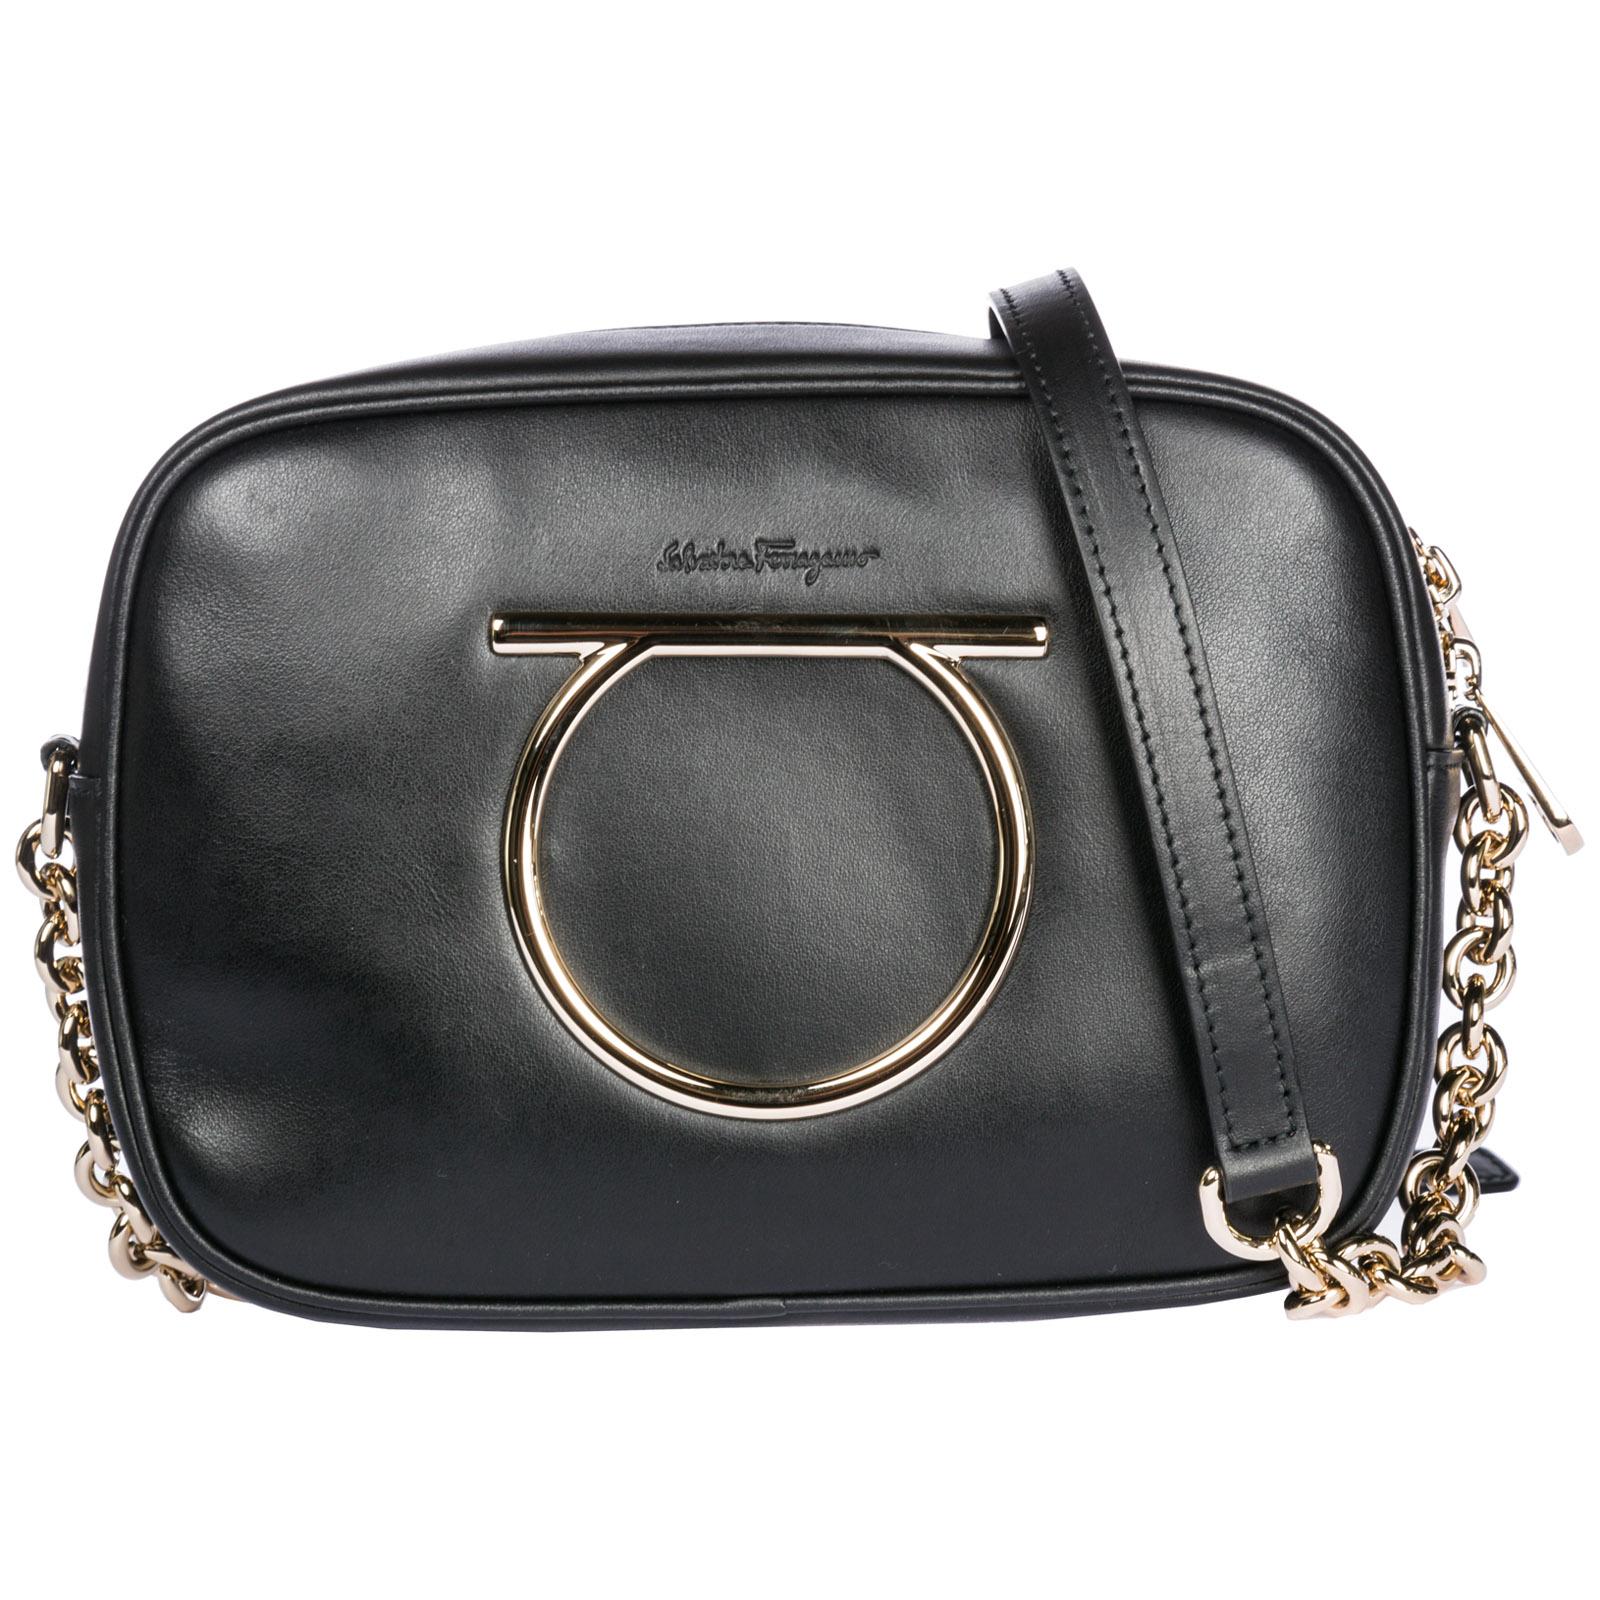 Salvatore Ferragamo Women S Leather Cross-Body Messenger Shoulder Bag  Camera Bag Gancini In Black bbaaa02f33